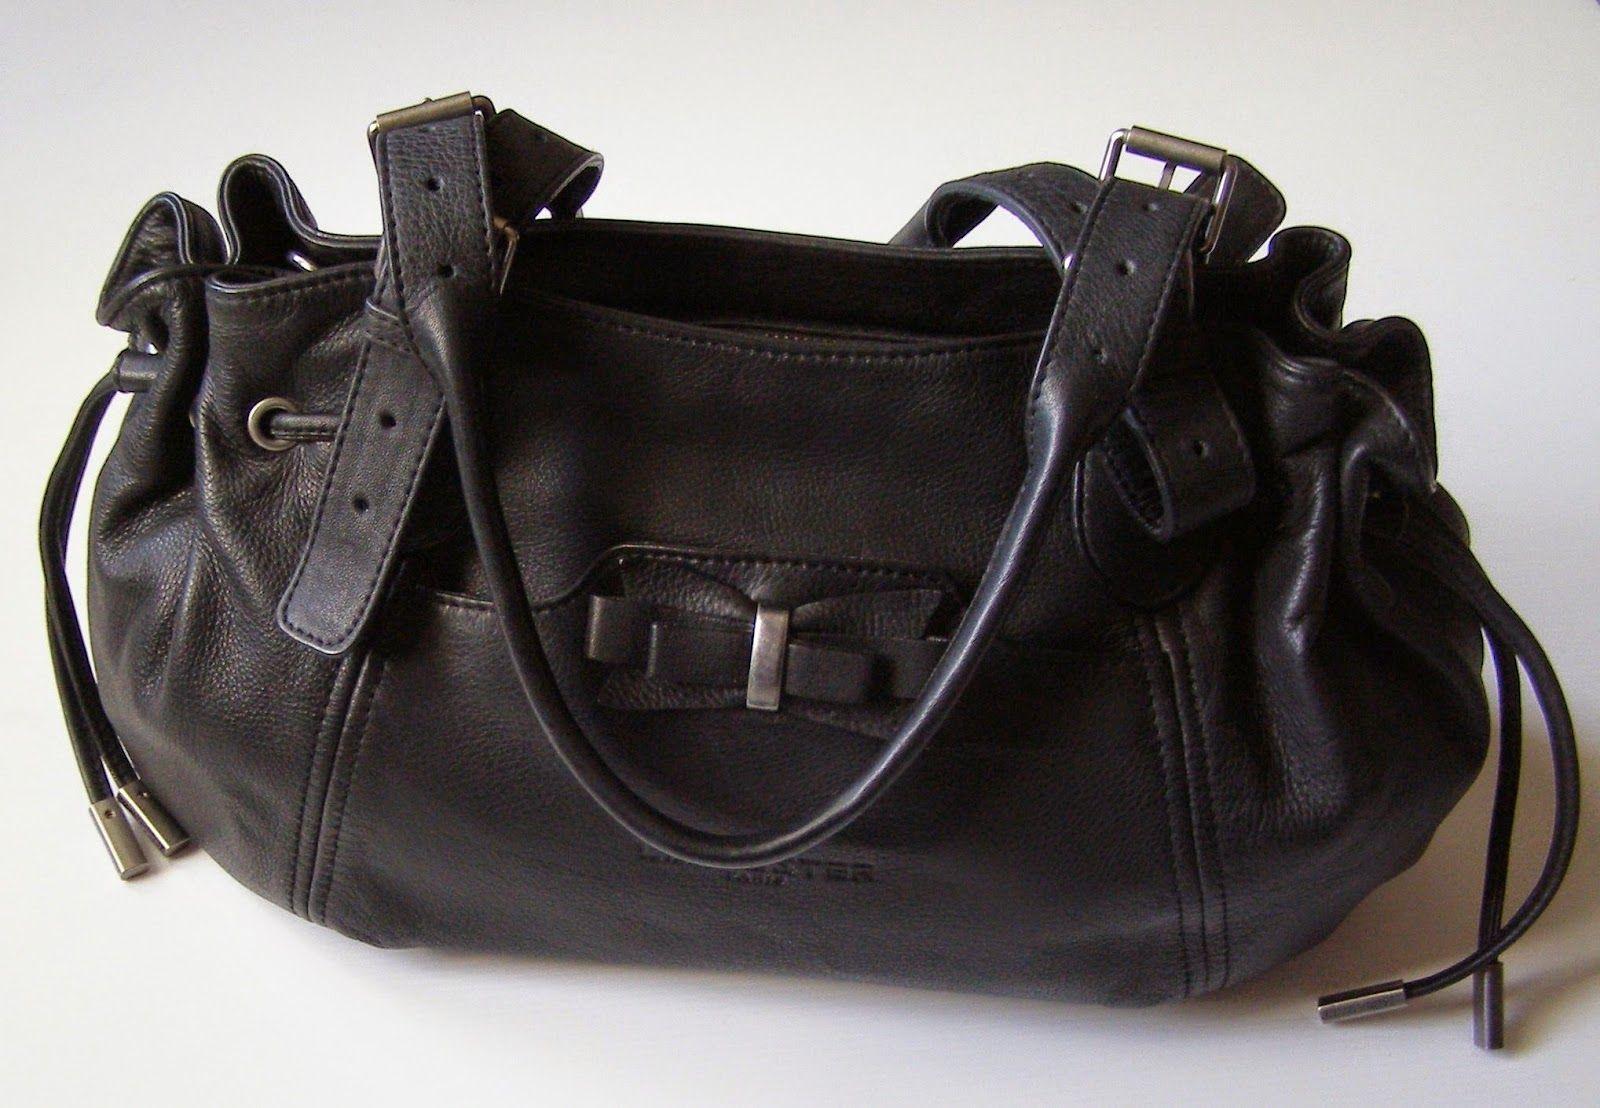 aaa352e8c1 sac à main Lancaster Mademoiselle Candice, ma dernière petite folie girly ;)